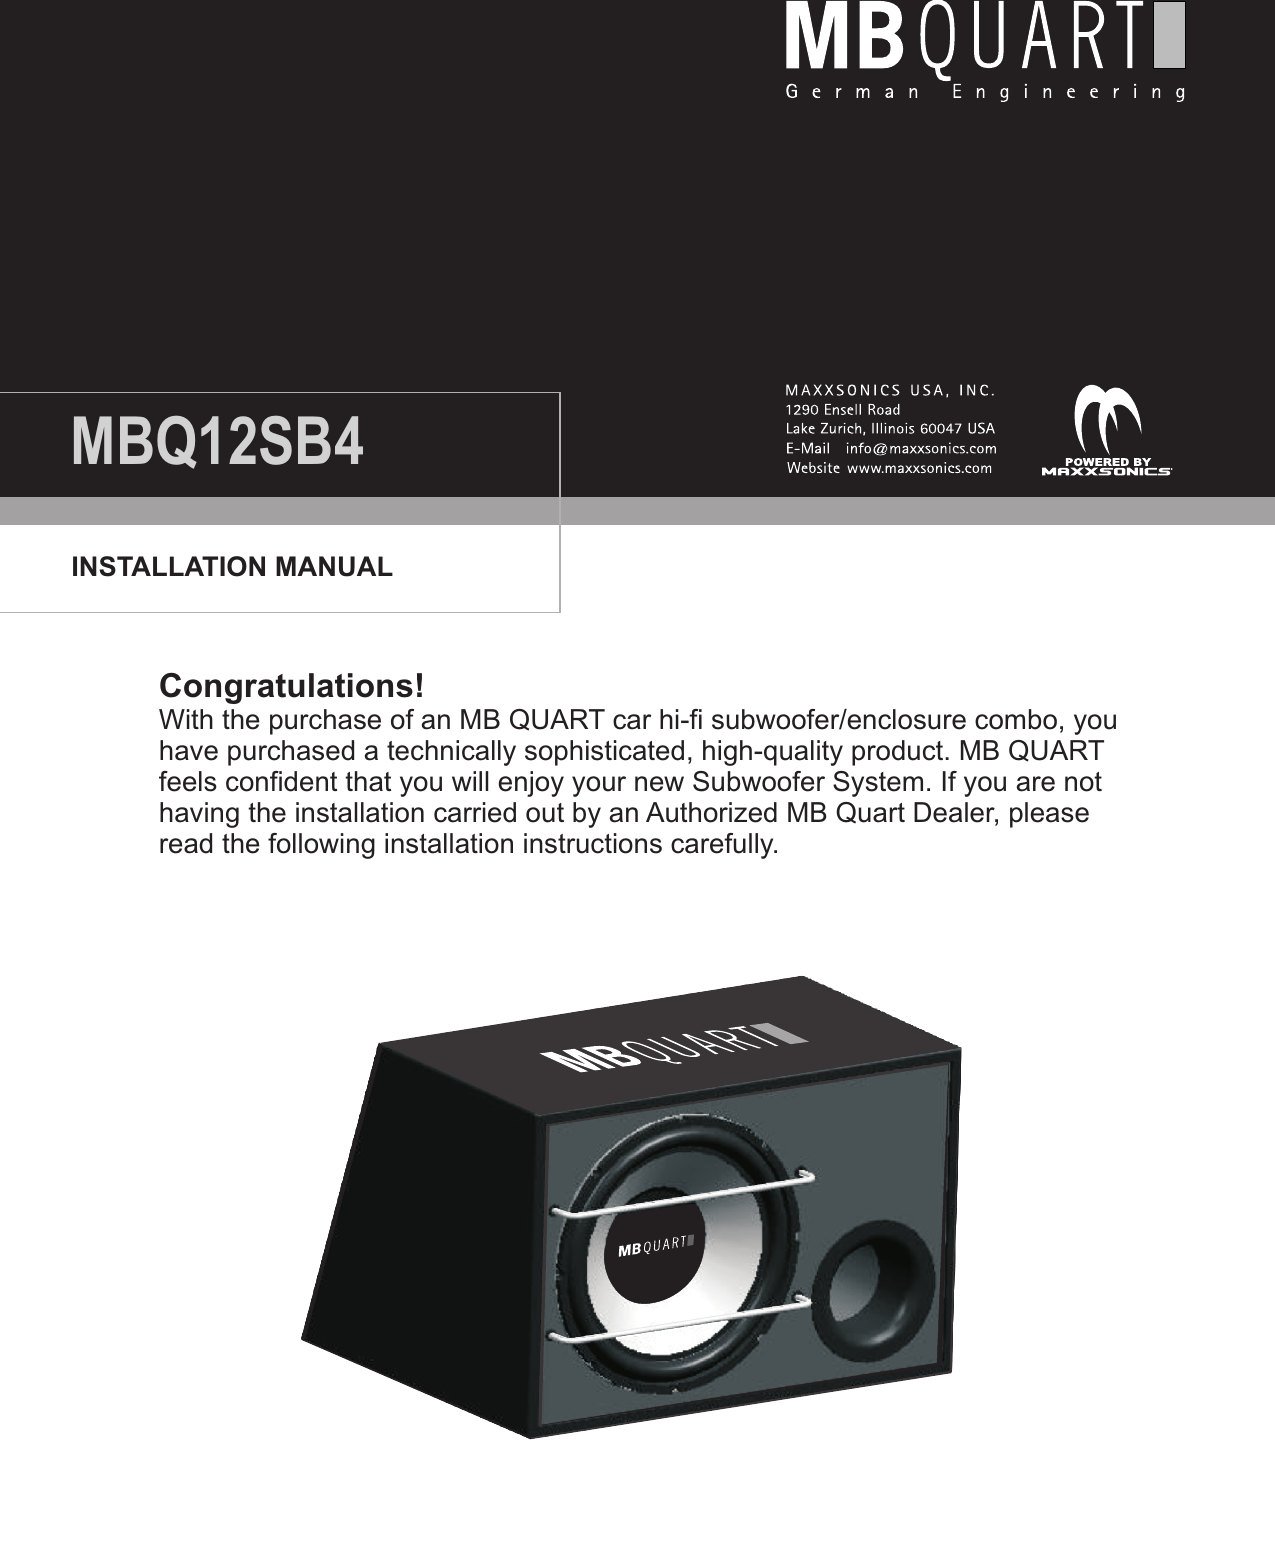 Mb Quart Subwoofer 2 Ohm Wiring Diagram Series Parallel Speaker Dvc Mbq12sb4 Users Manual On Woofer